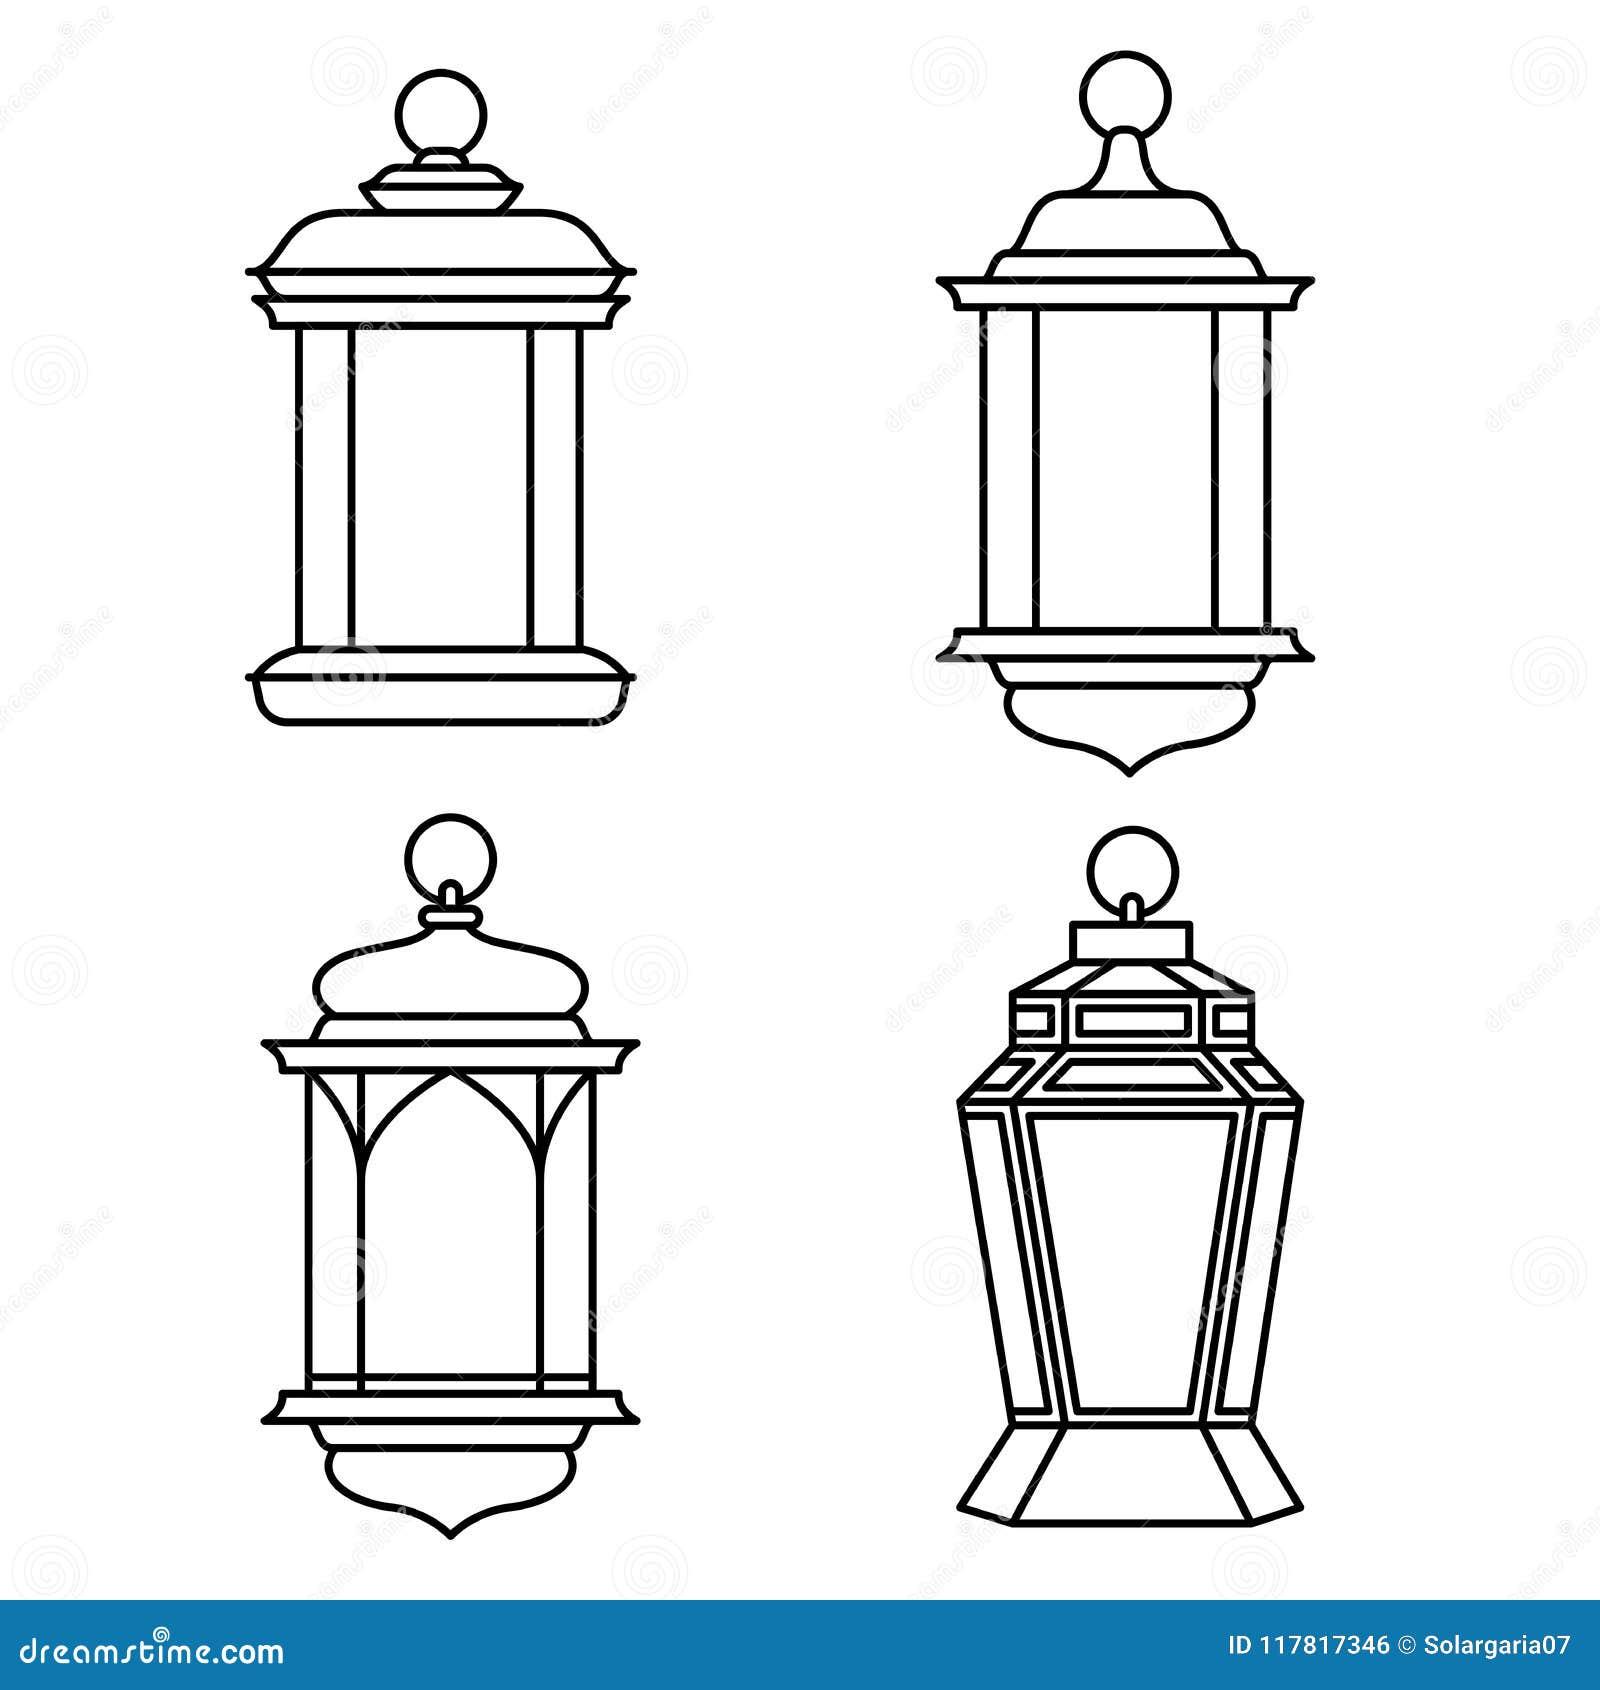 Set Of Ramadan Lanterns Vector Illustration Stock Vector Illustration Of Lanterns Holiday 117817346